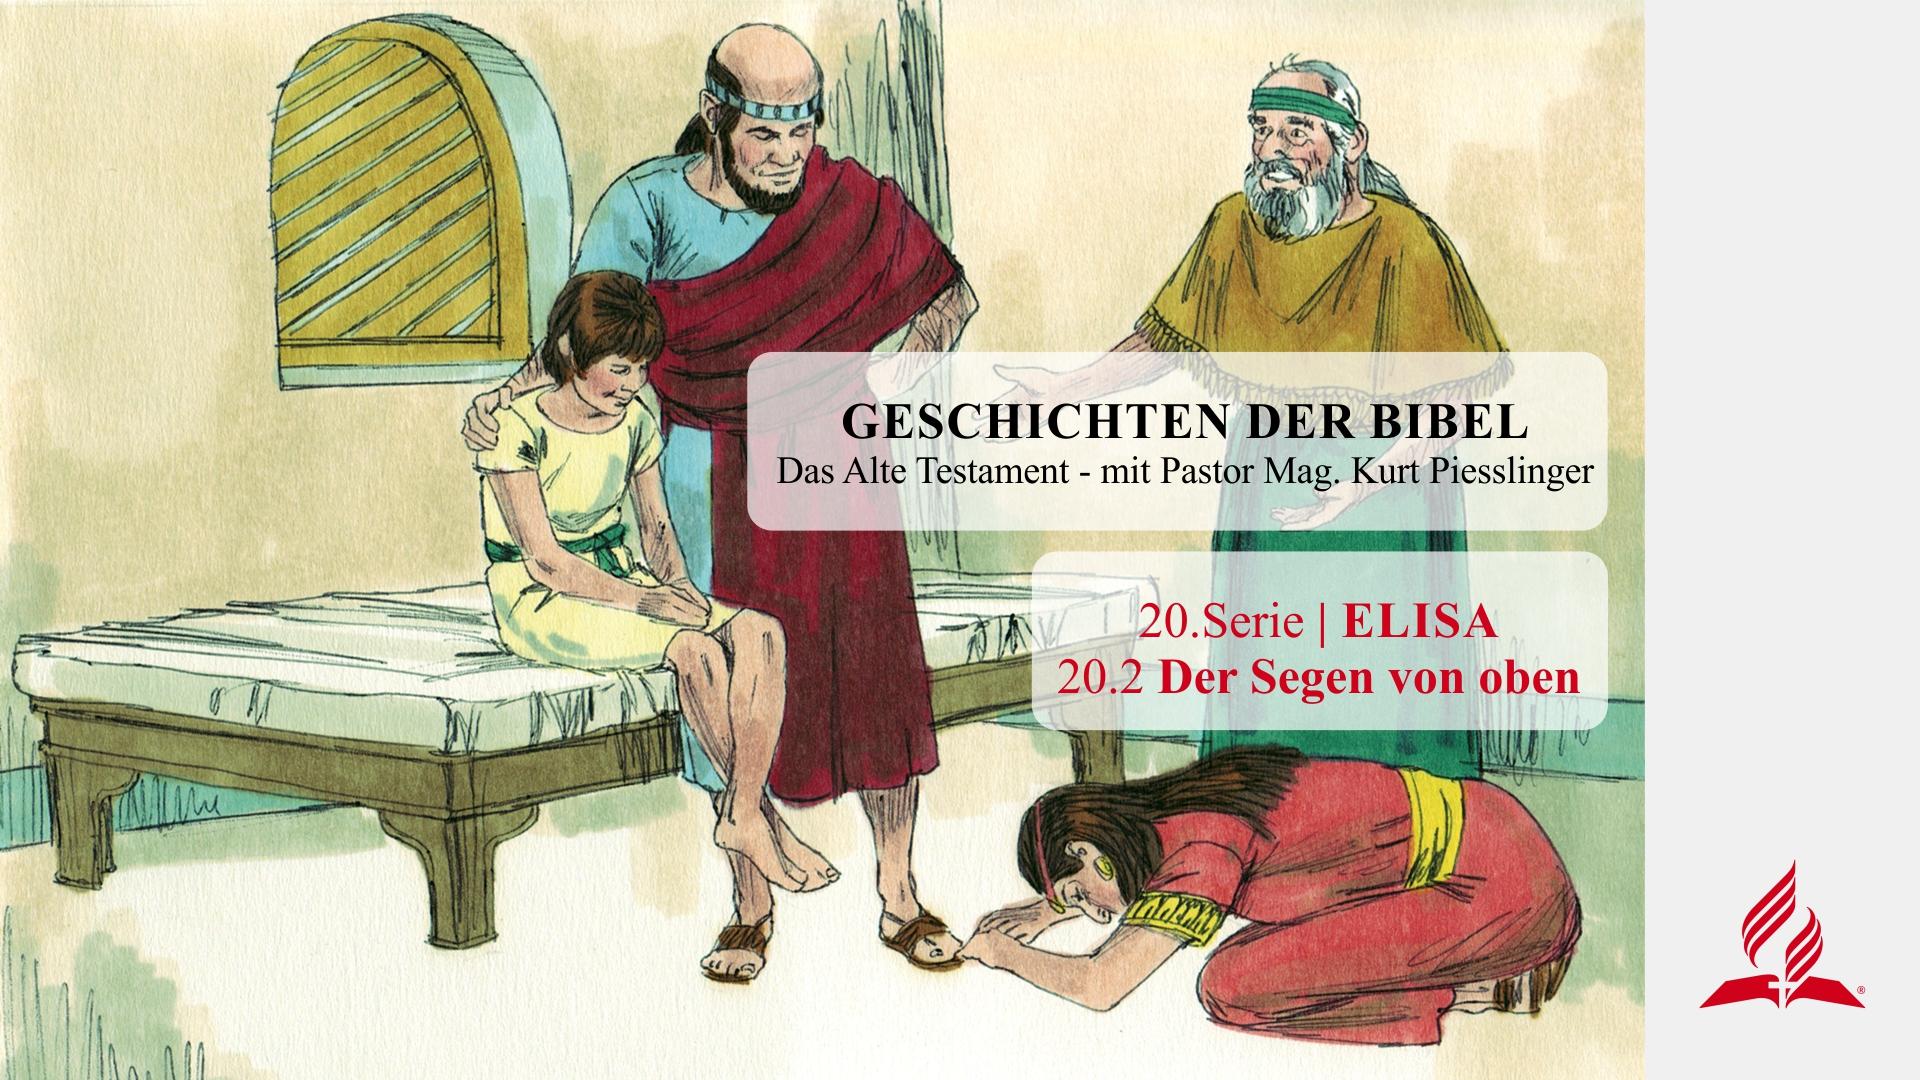 GESCHICHTEN DER BIBEL : 20.2 Der Segen von oben – 20.ELISA   Pastor Mag. Kurt Piesslinger